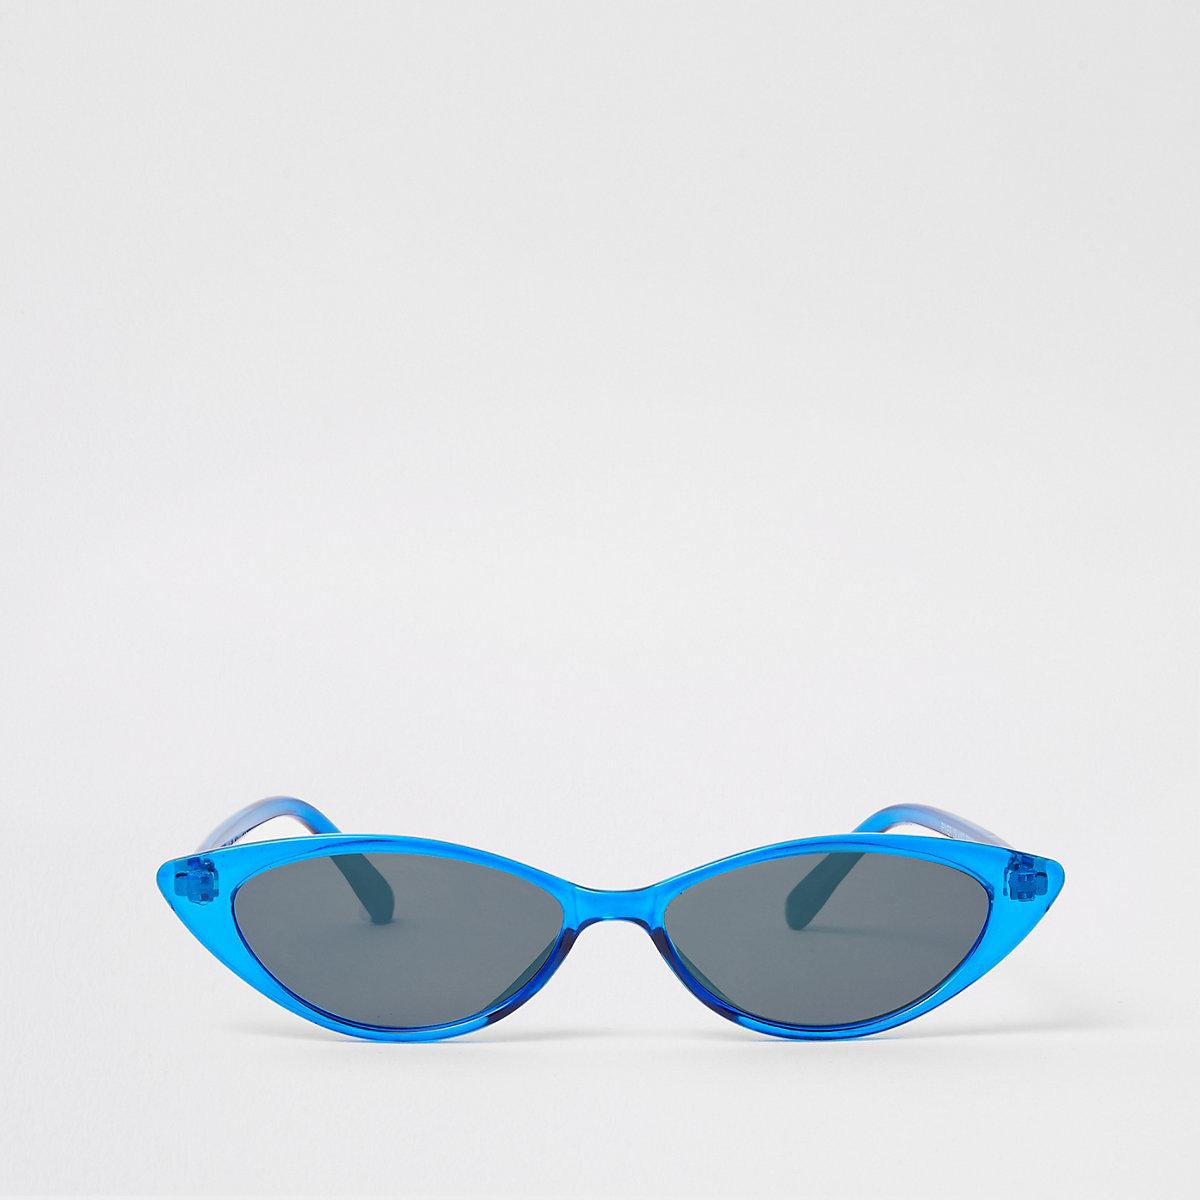 Blue slim cat eye pointed sunglasses